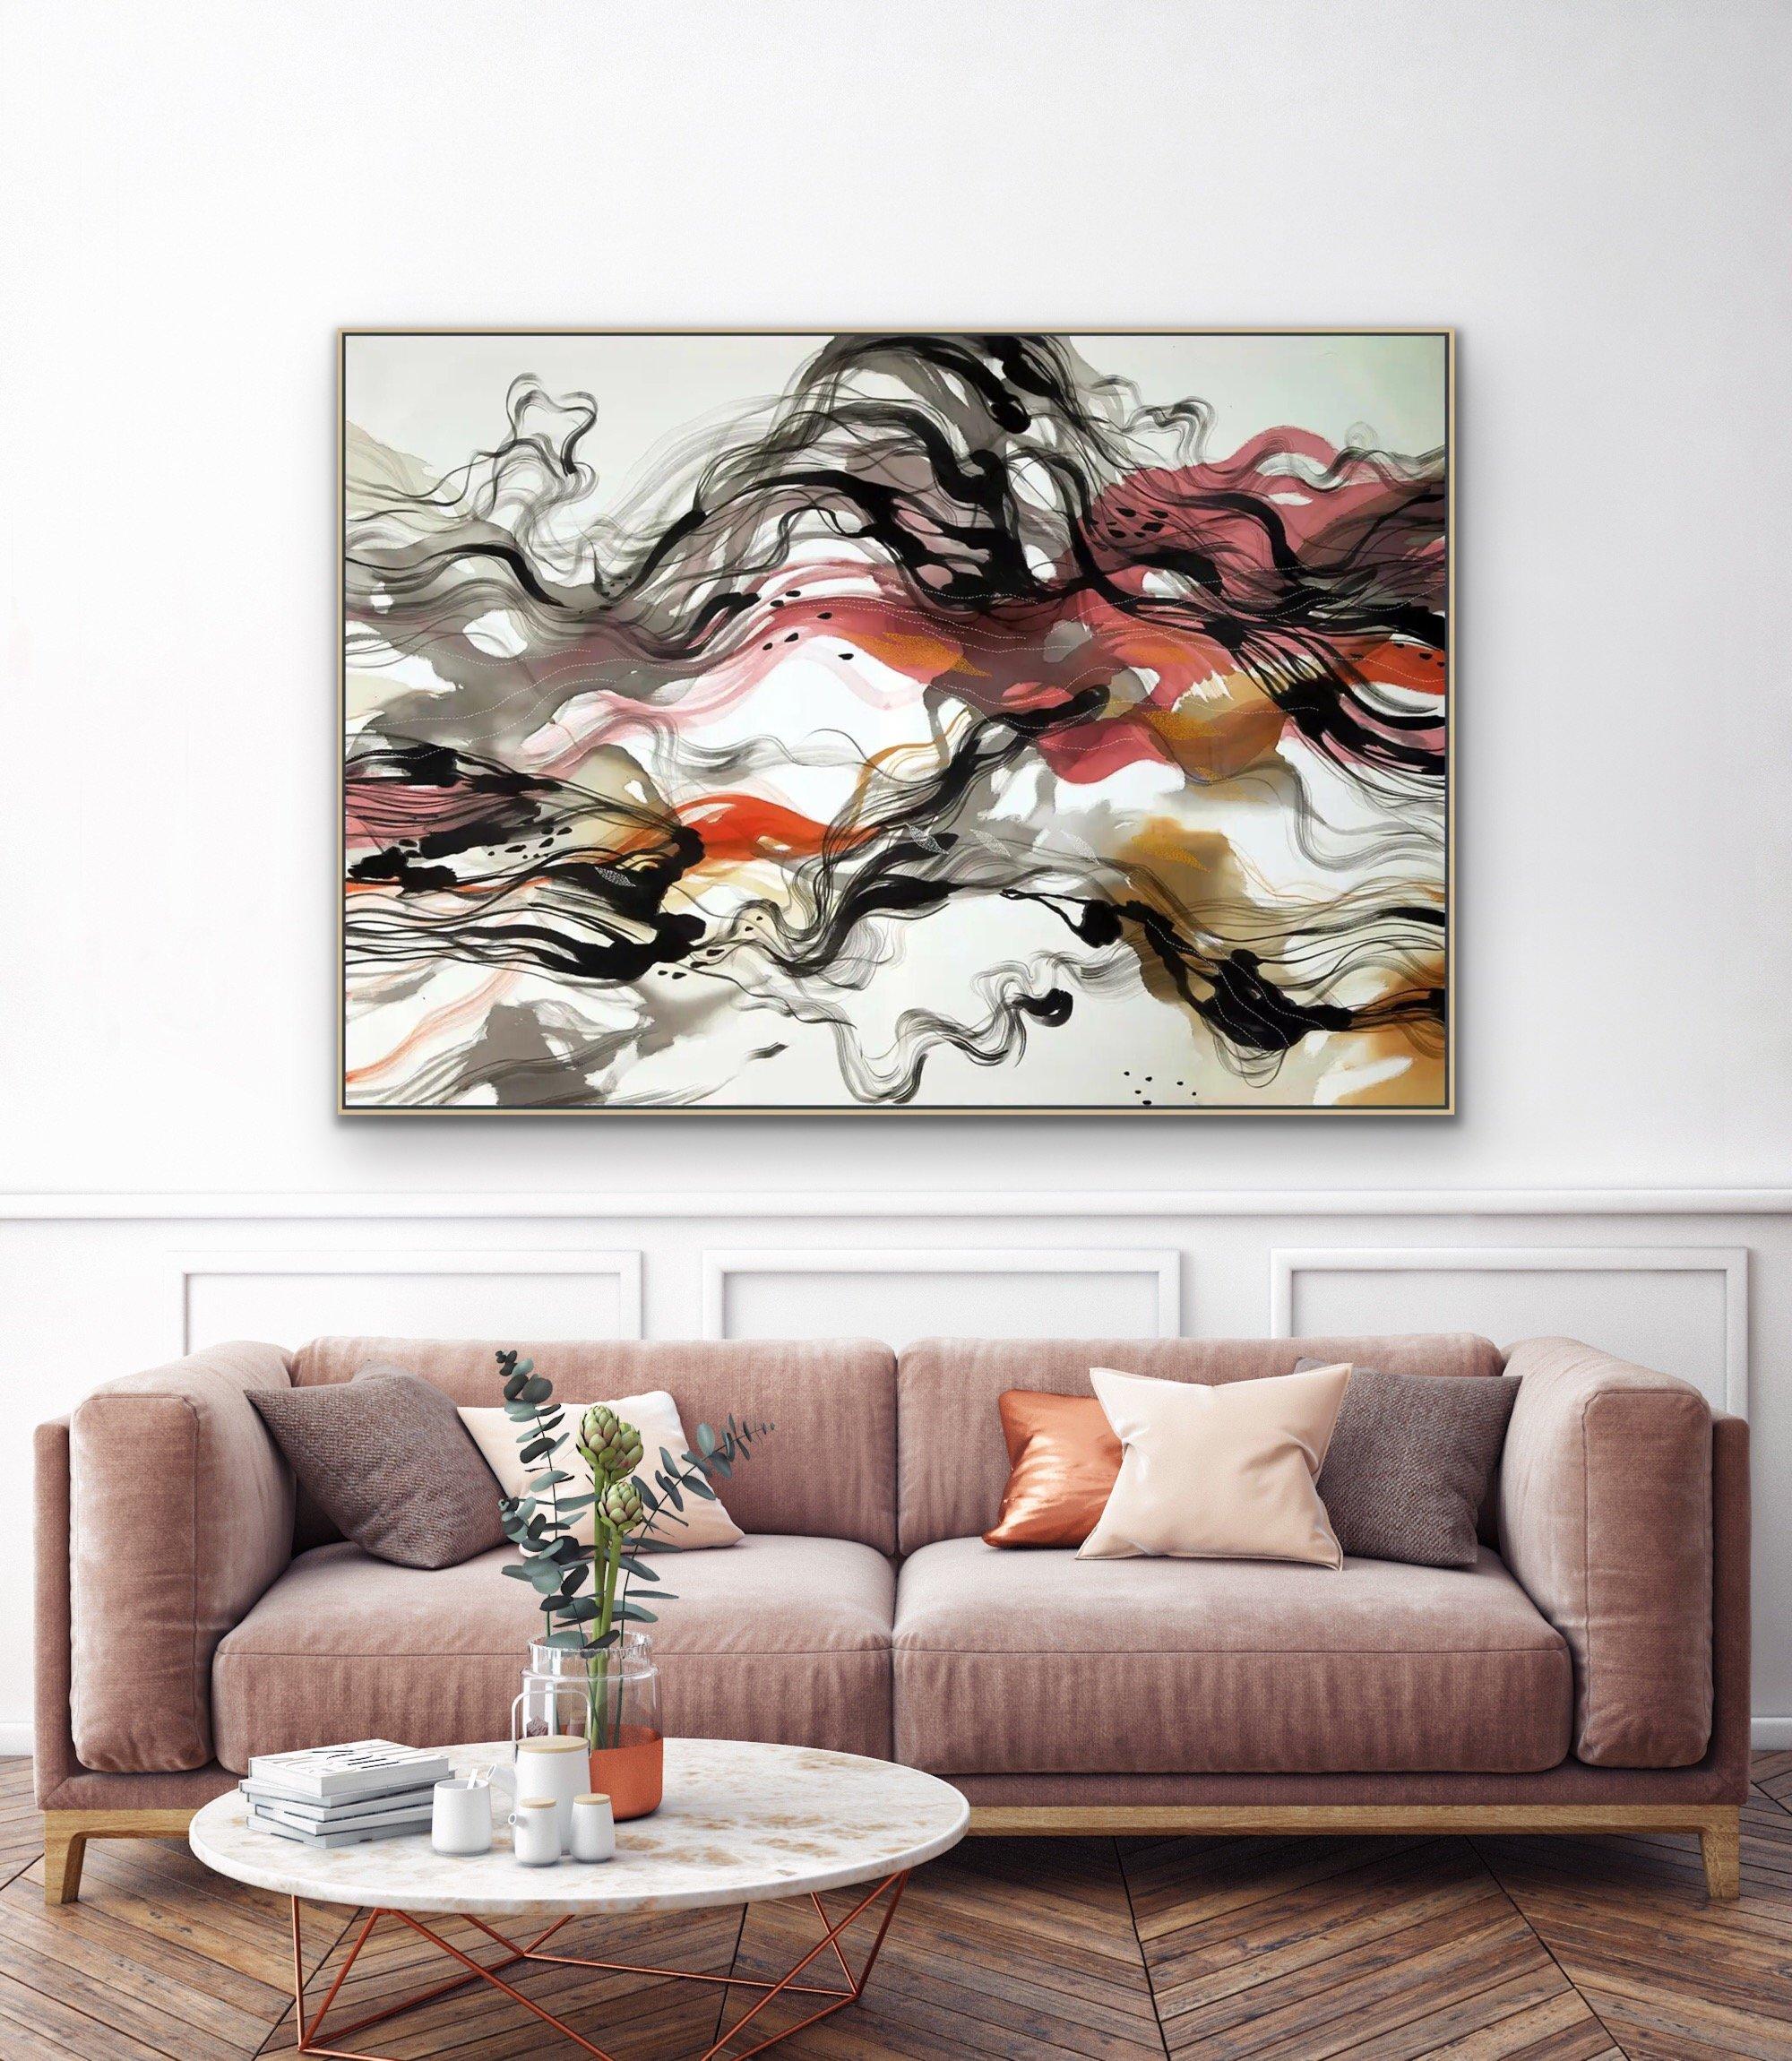 """Follow Me"" an original painting by John Martono Gallery"